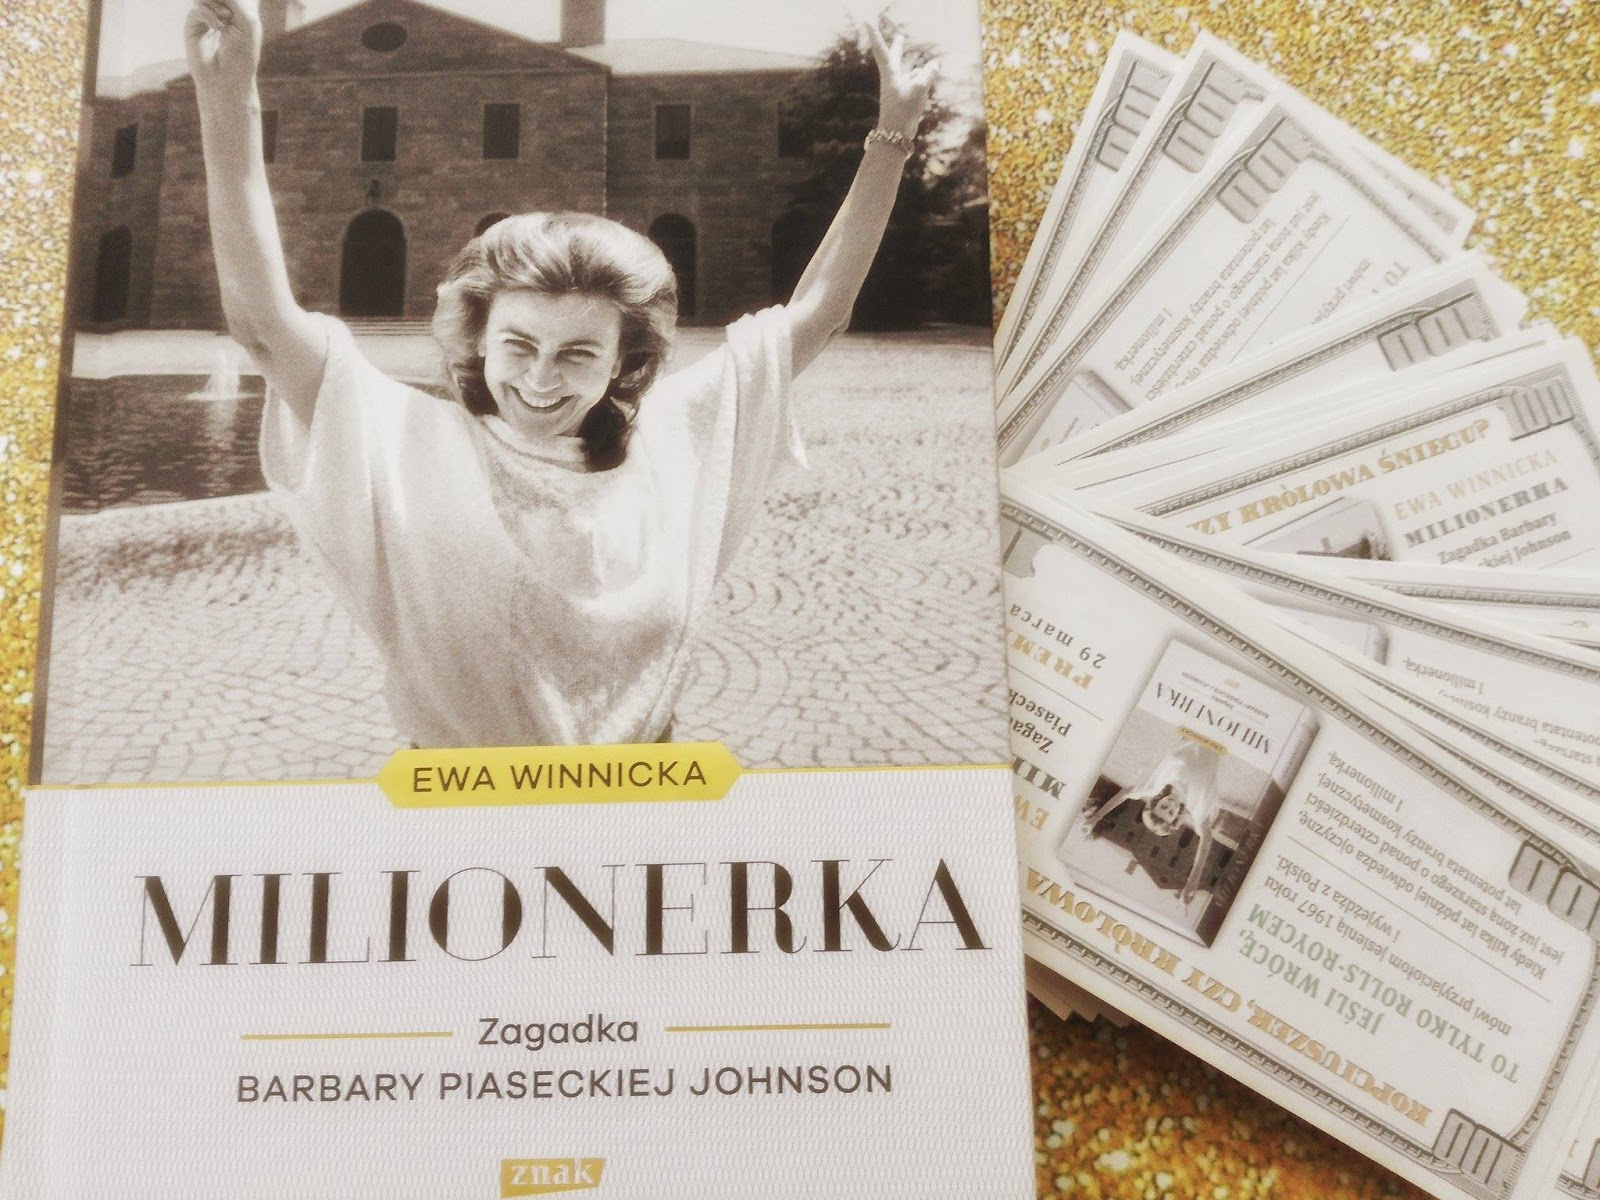 Milionerka. Zagadka Barbary Piaseckiej-Johnson Ewa Winnicka - recenzja